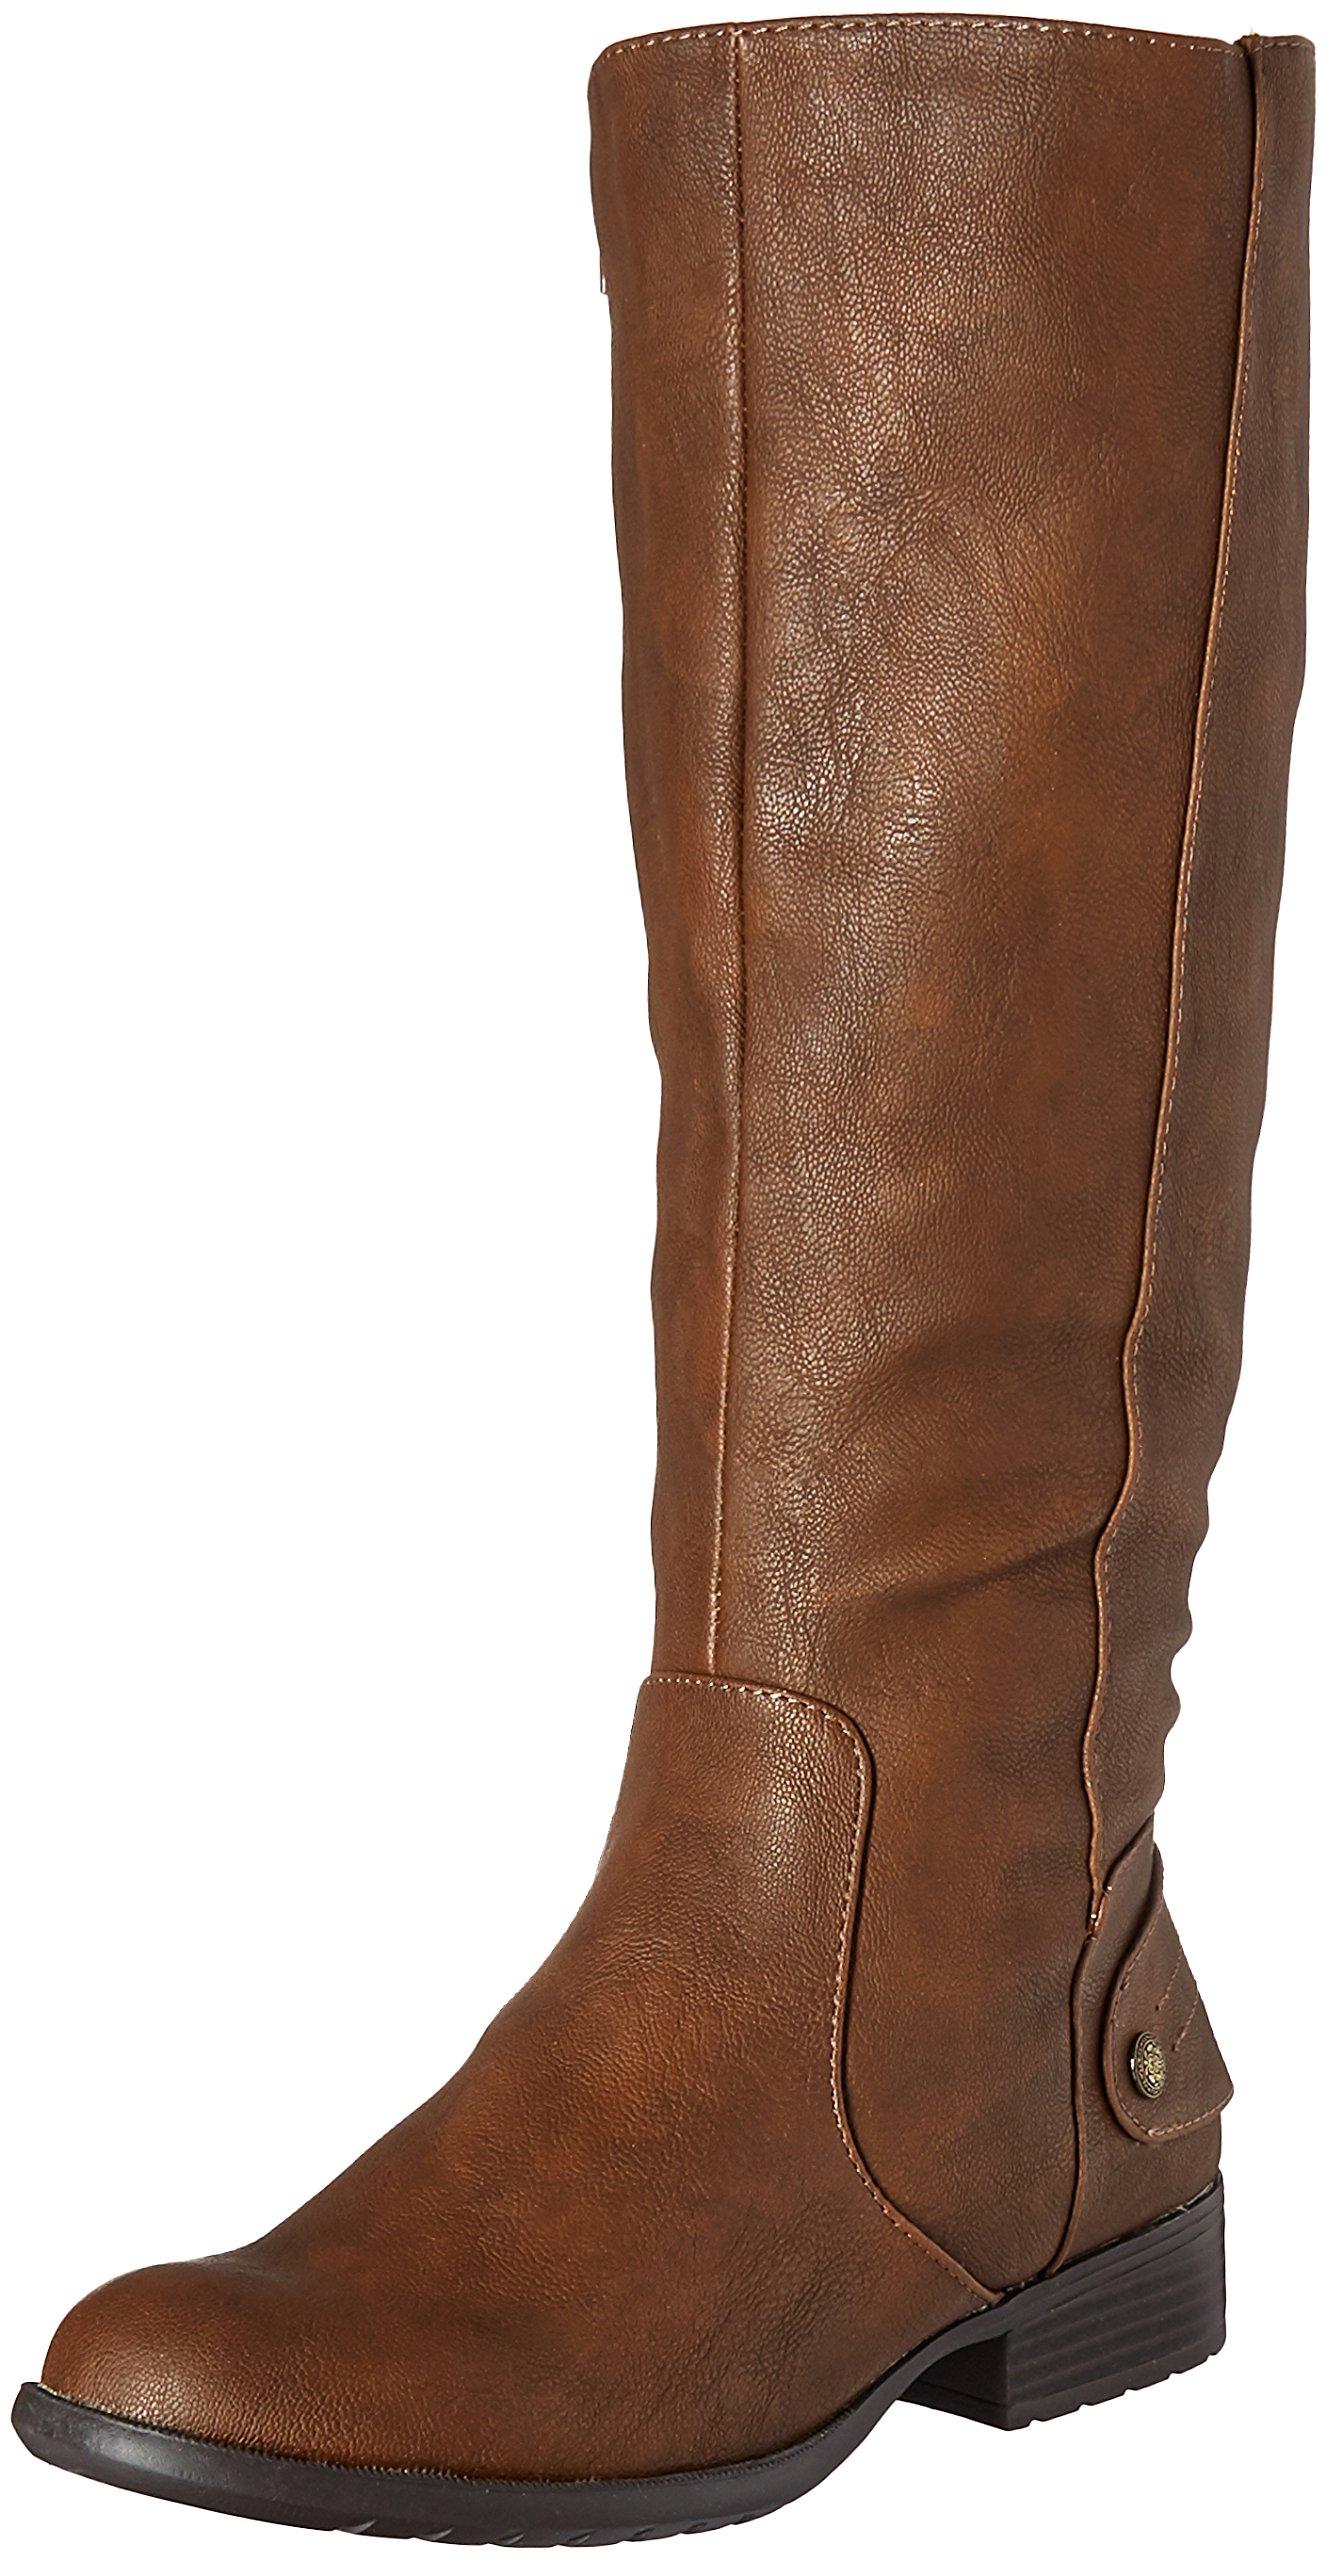 LifeStride Women's Xandywc Riding Boot- Wide Calf, Dark Tan, 8.5 M US